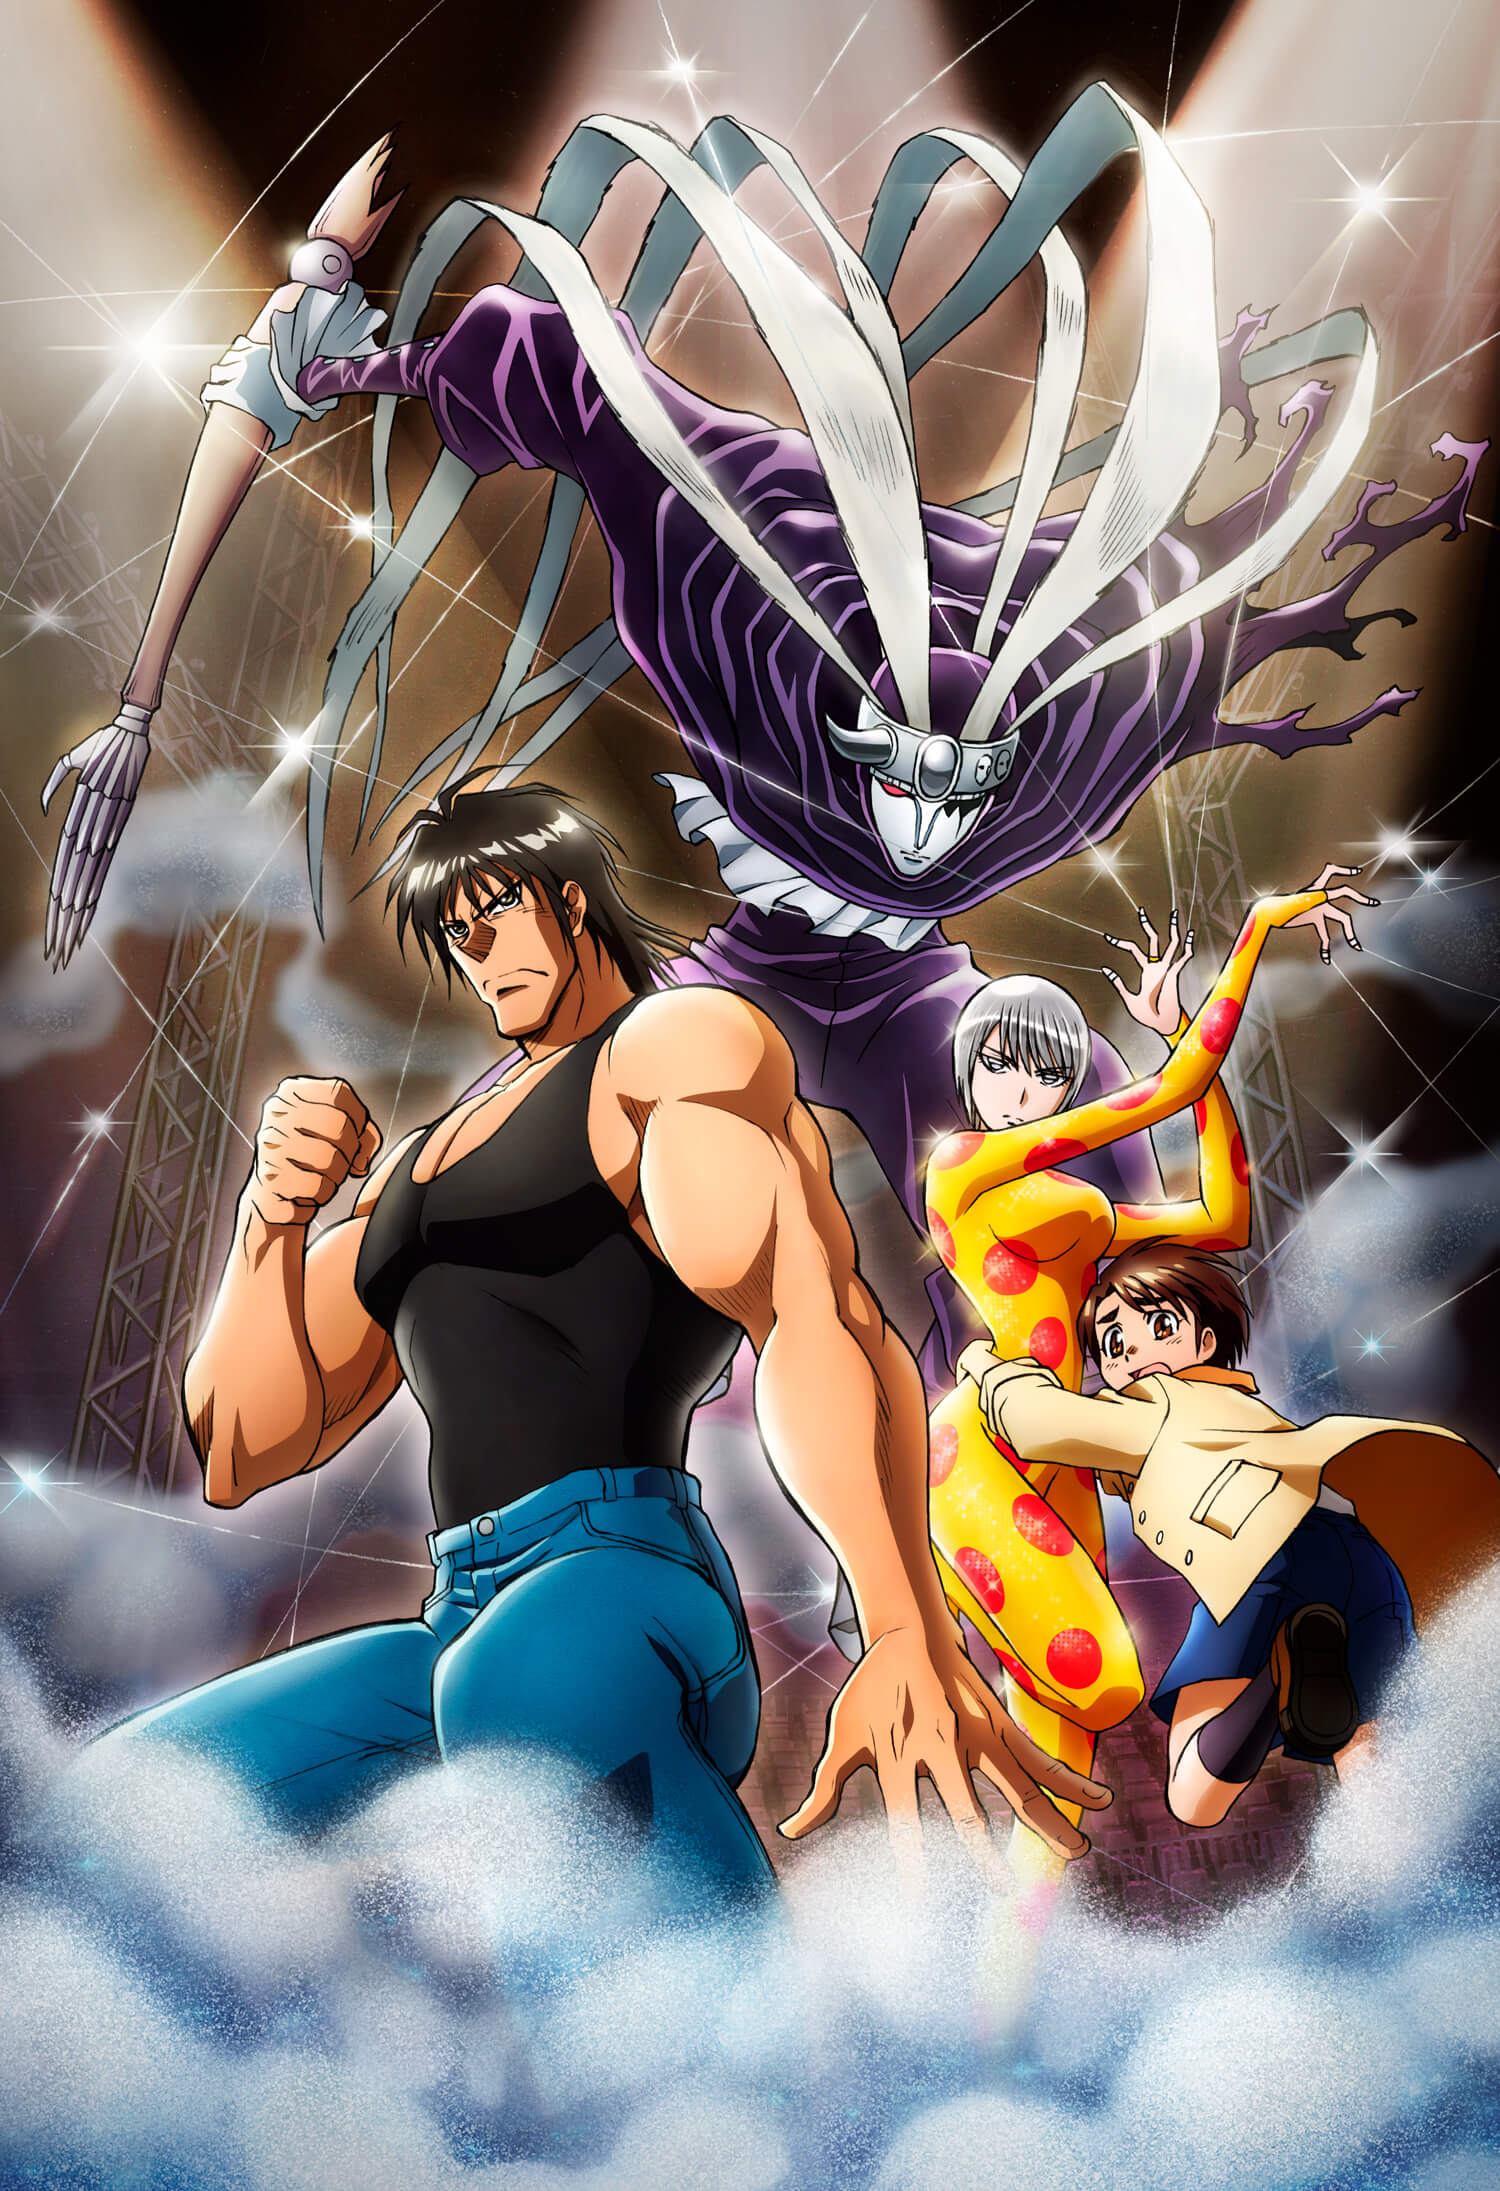 TV Anime Karakuri Circus Ending Theme 'Marionette' to be